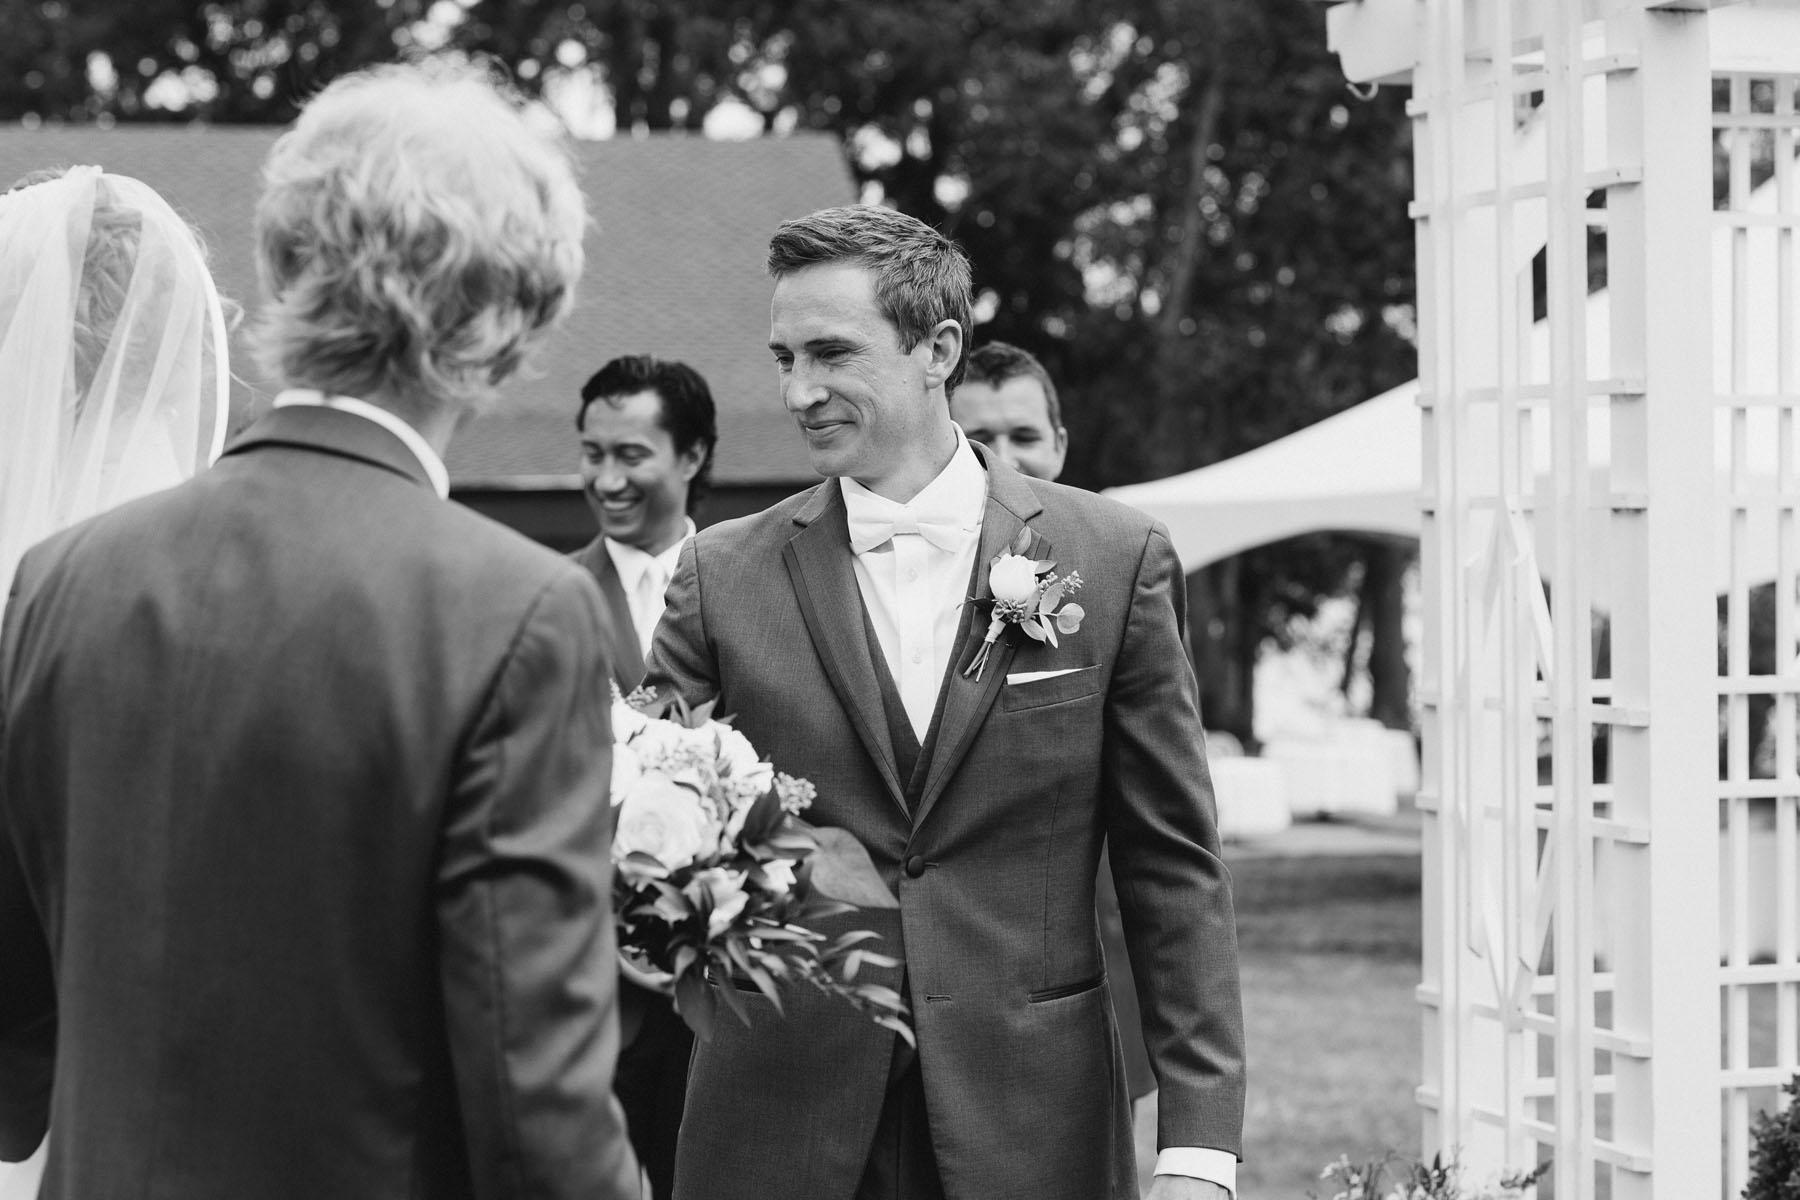 thetis-island-wedding-photographer-rp-rn-075.jpg